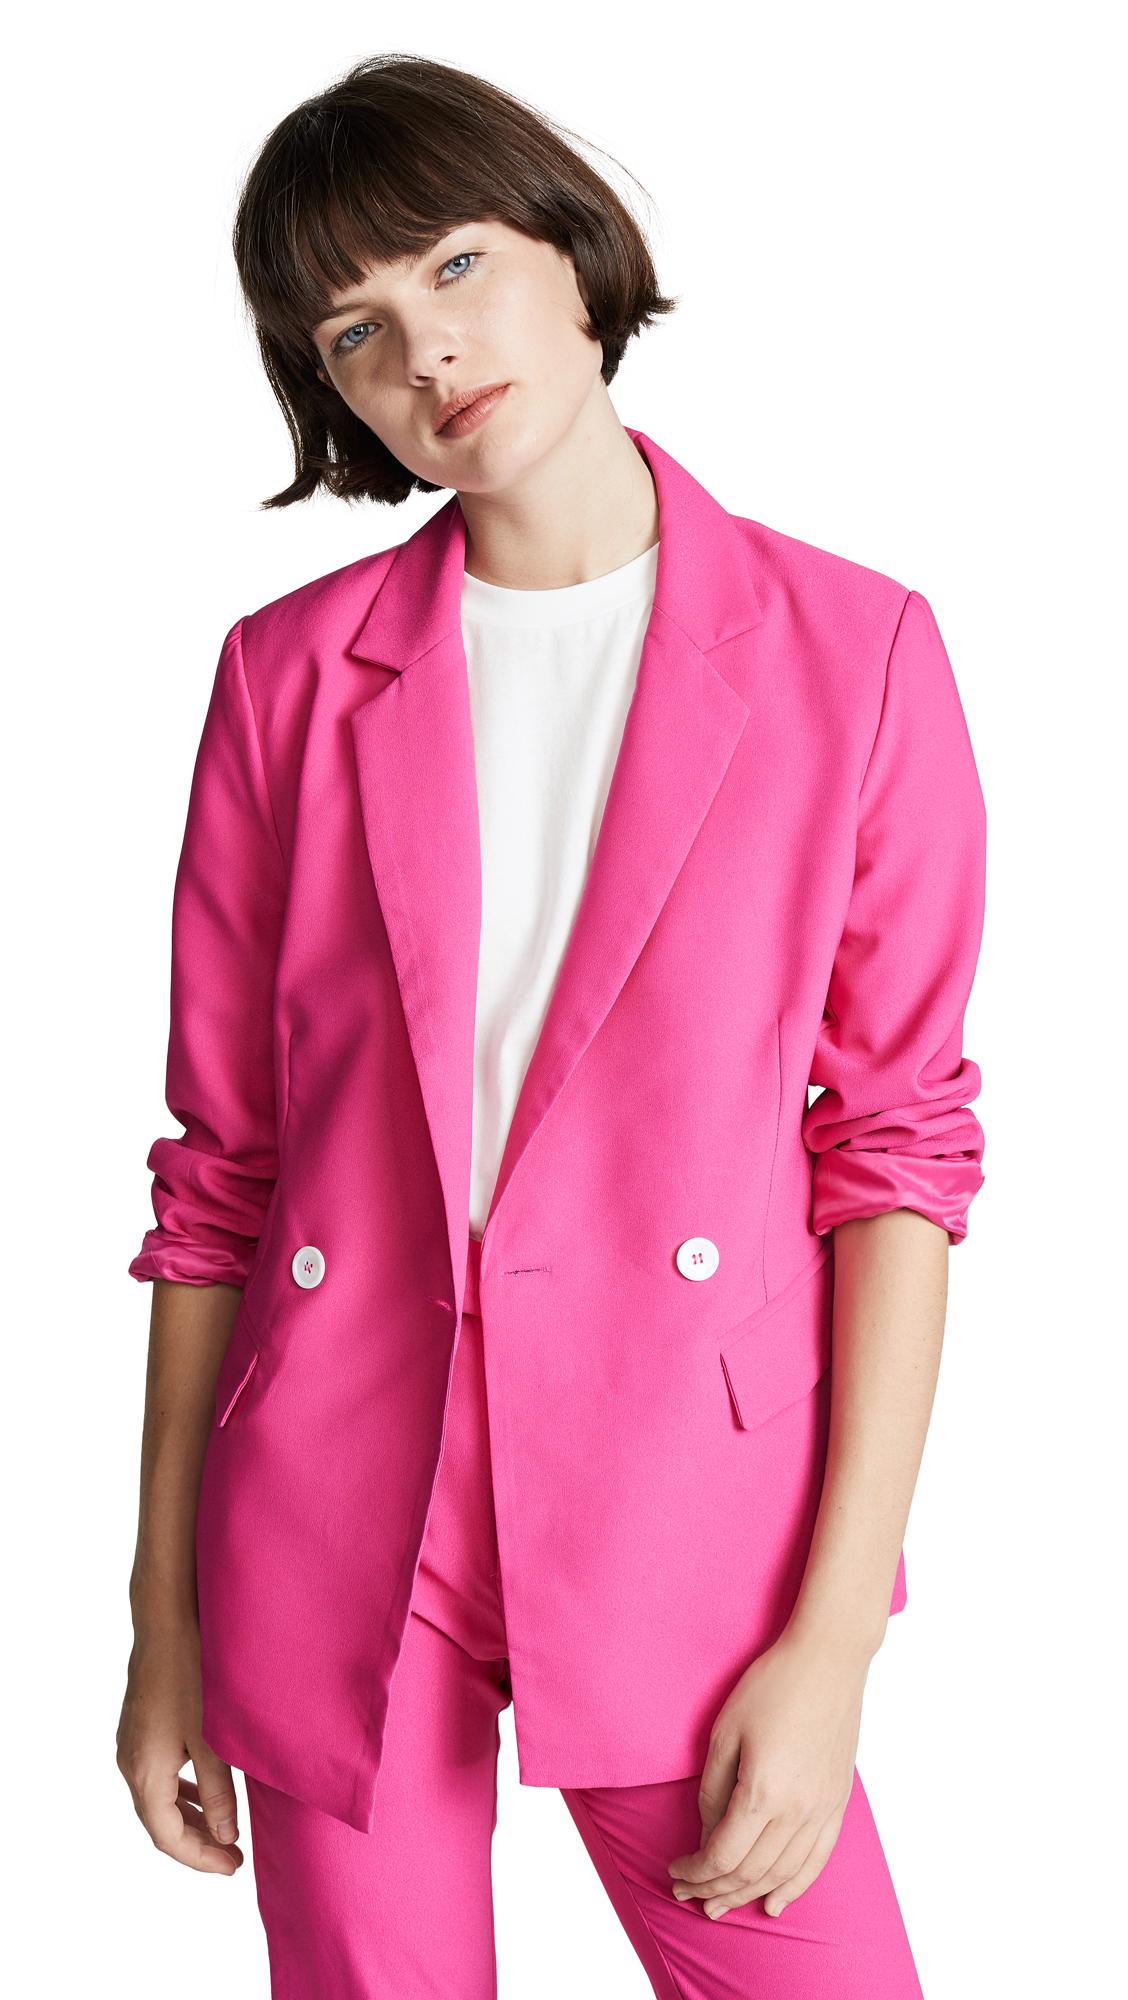 RE:NAMED Re: Named Krista Blazer in Hot Pink